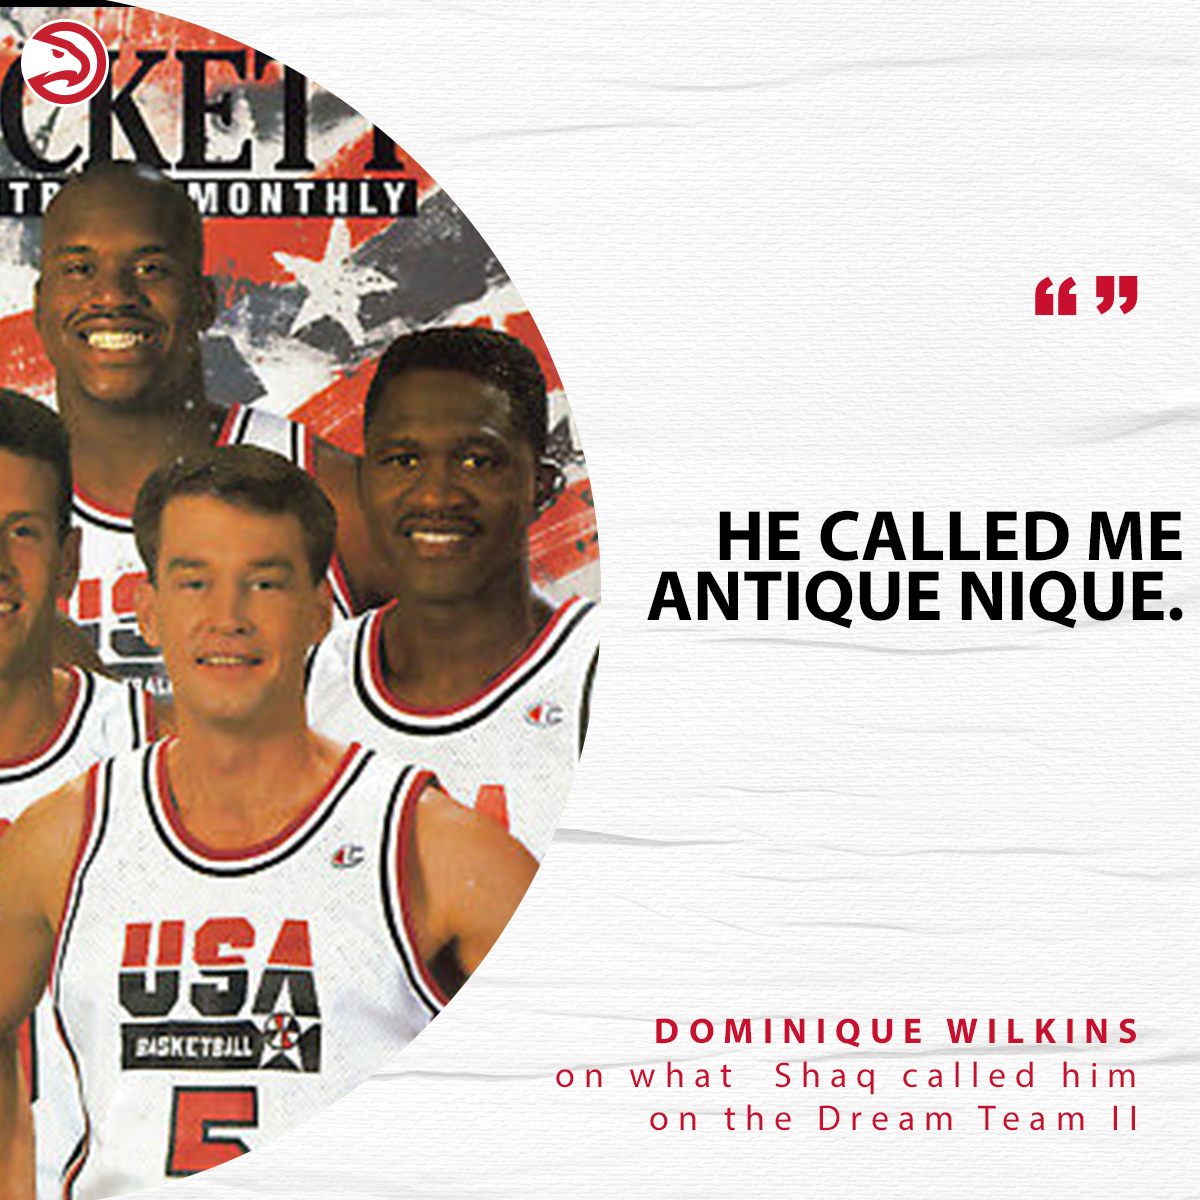 .@SHAQ really called @DWilkins21 'Antique Nique' while on the Dream Team 2 😂😂😂  (photo: Beckett Basketball Monthly, 1994 cover)  #TrueToAtlanta | @statefarm https://t.co/jURecY4n9B